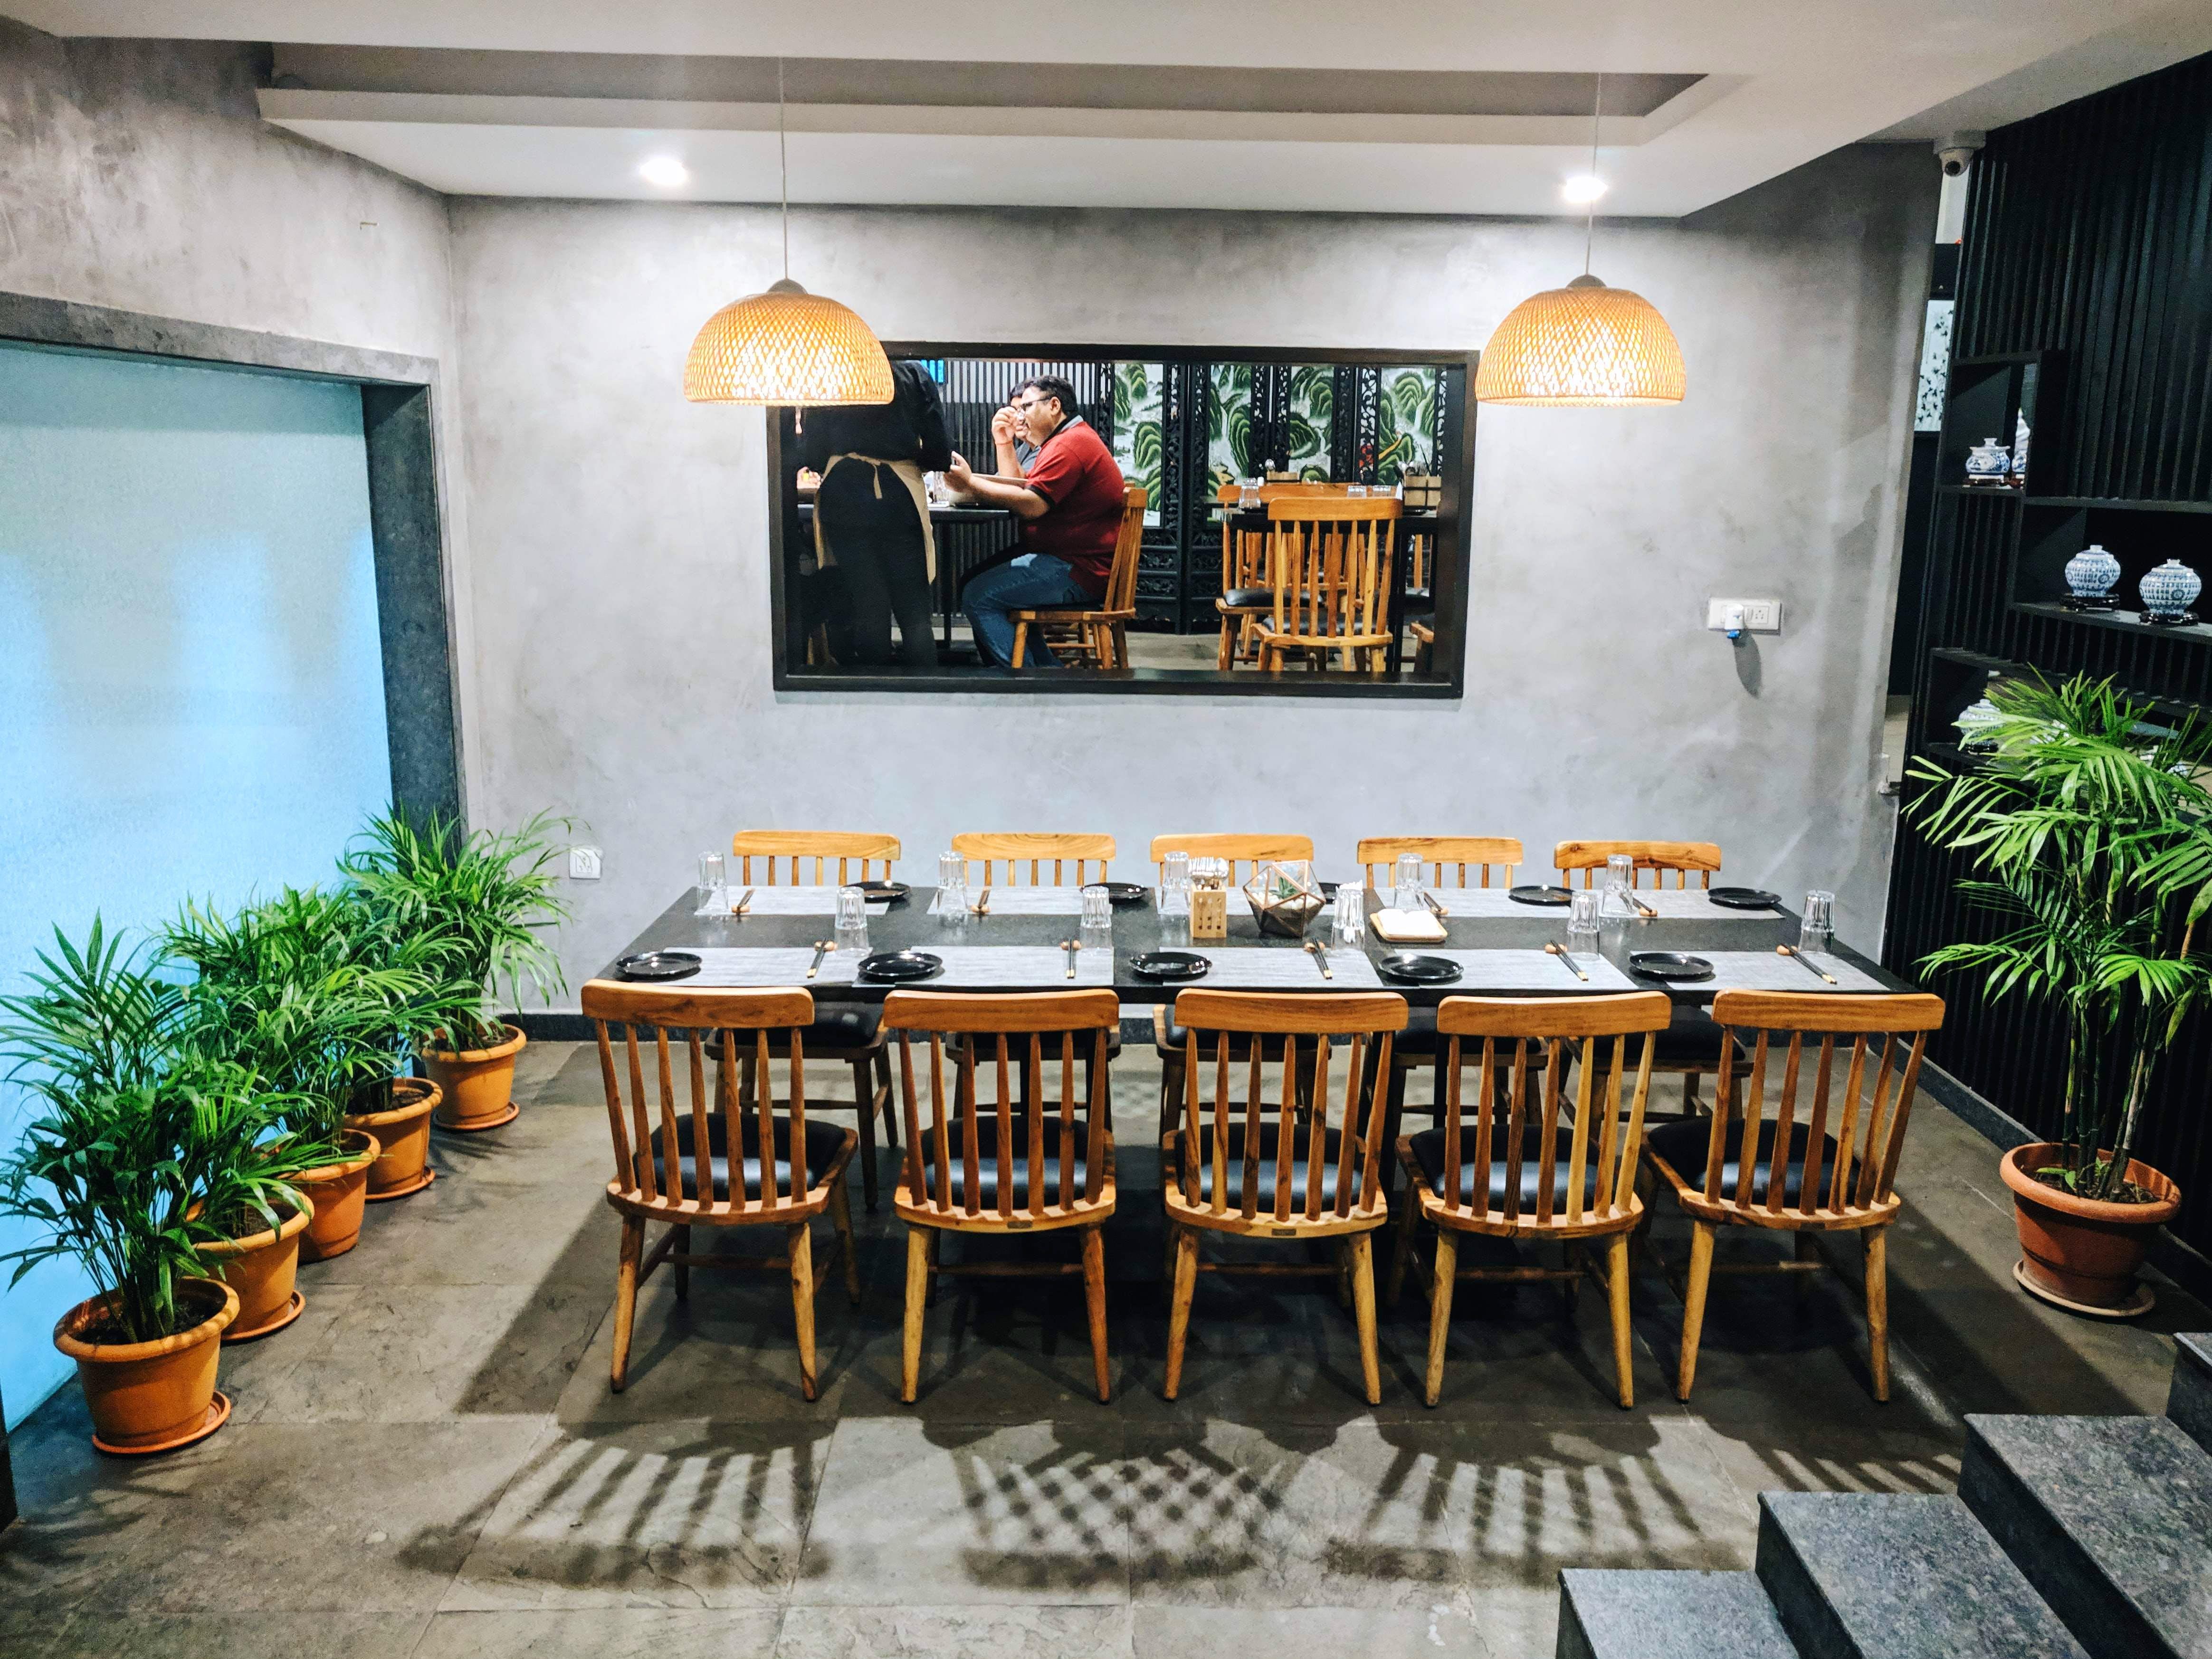 Room,Property,Restaurant,Building,Table,Interior design,Furniture,House,Dining room,Brunch